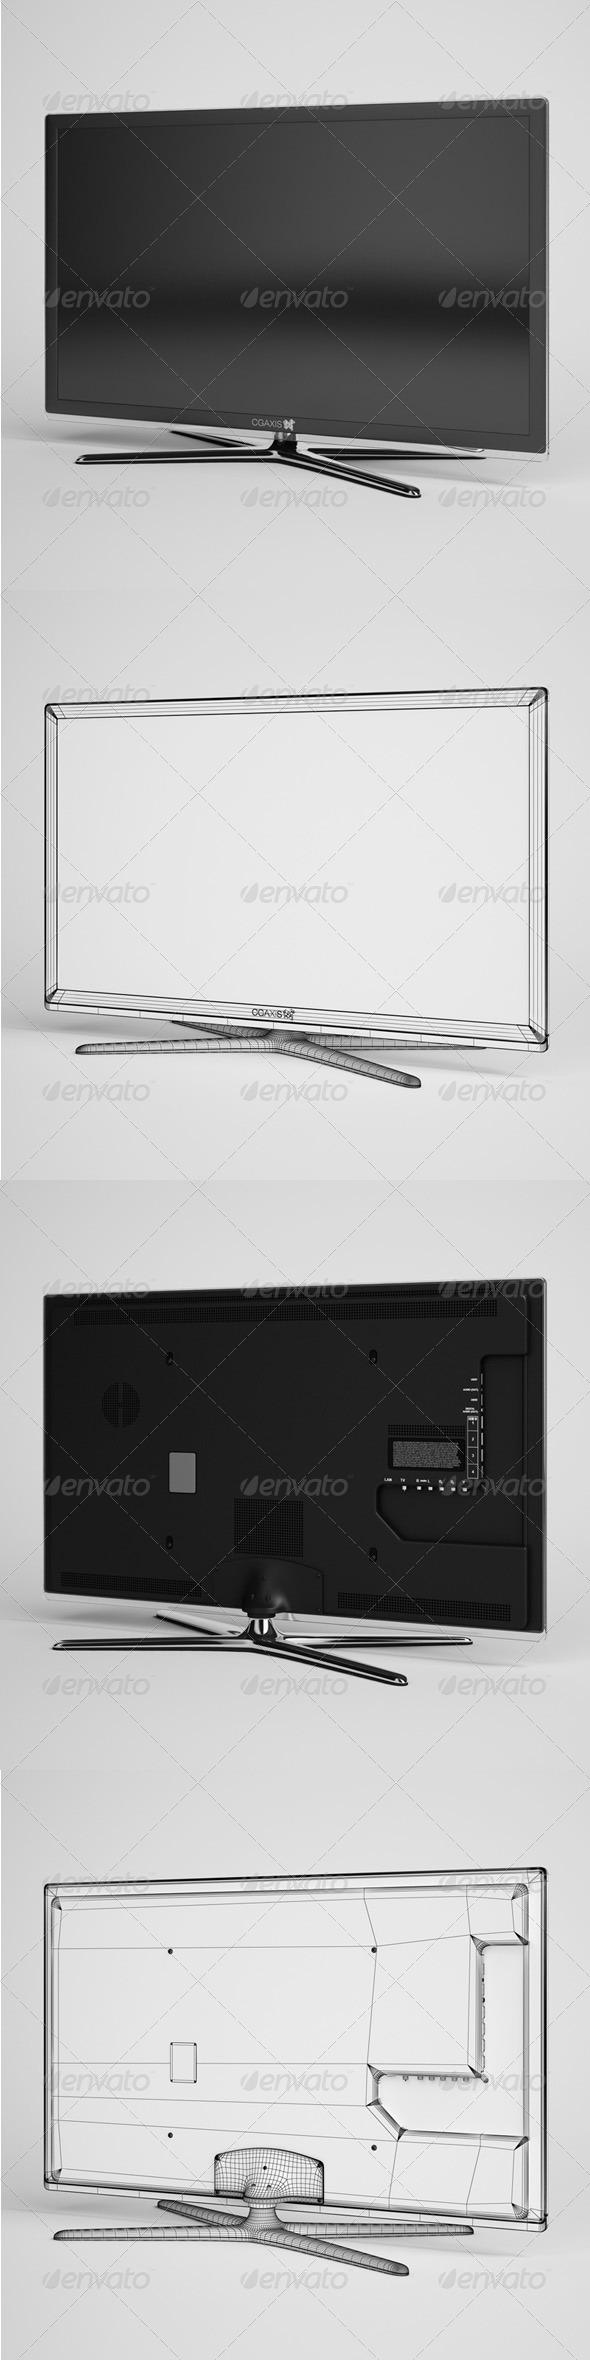 3DOcean CGAxis TV Flatscreen Electronics 01 165740